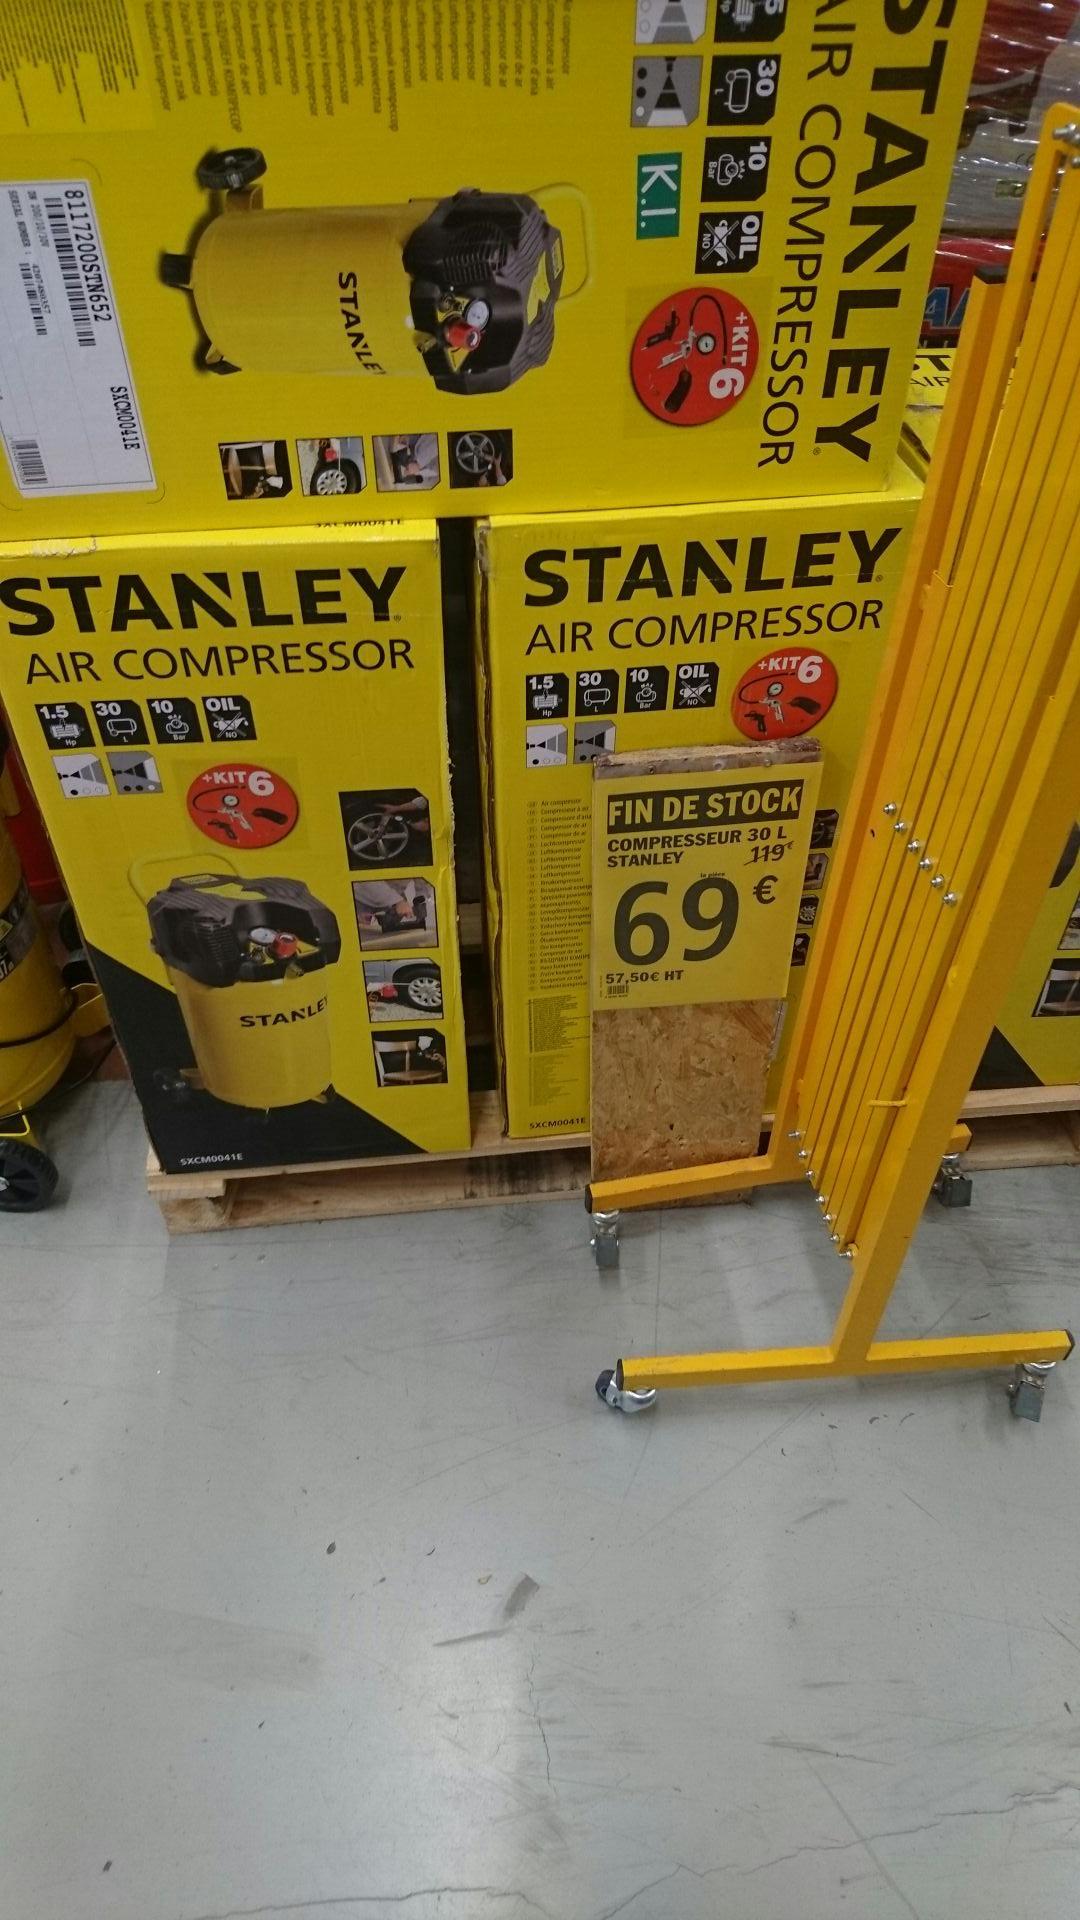 Compresseur Stanley - 30L, 10 bar